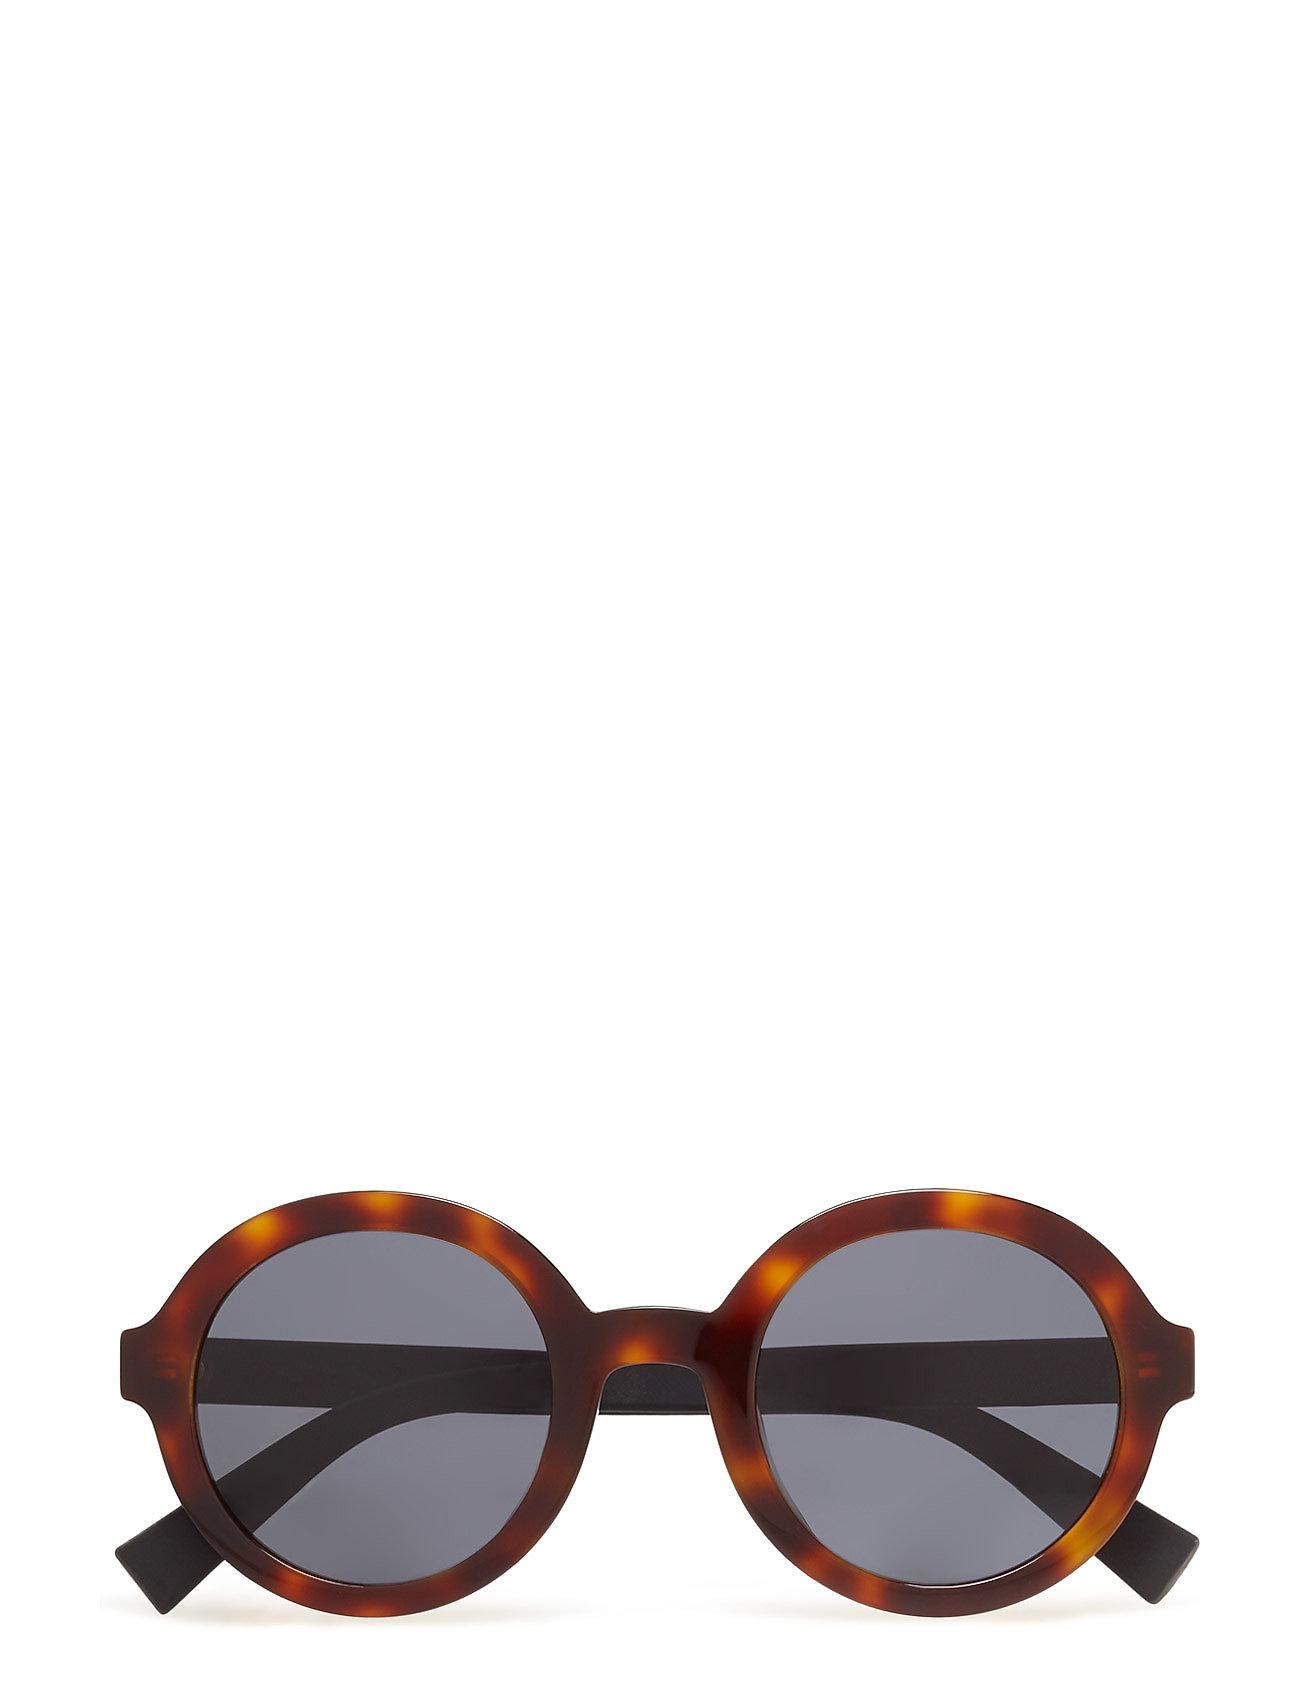 Mm Tailored Iii MAXMARA Sunglasses Solbriller til Kvinder i Brun